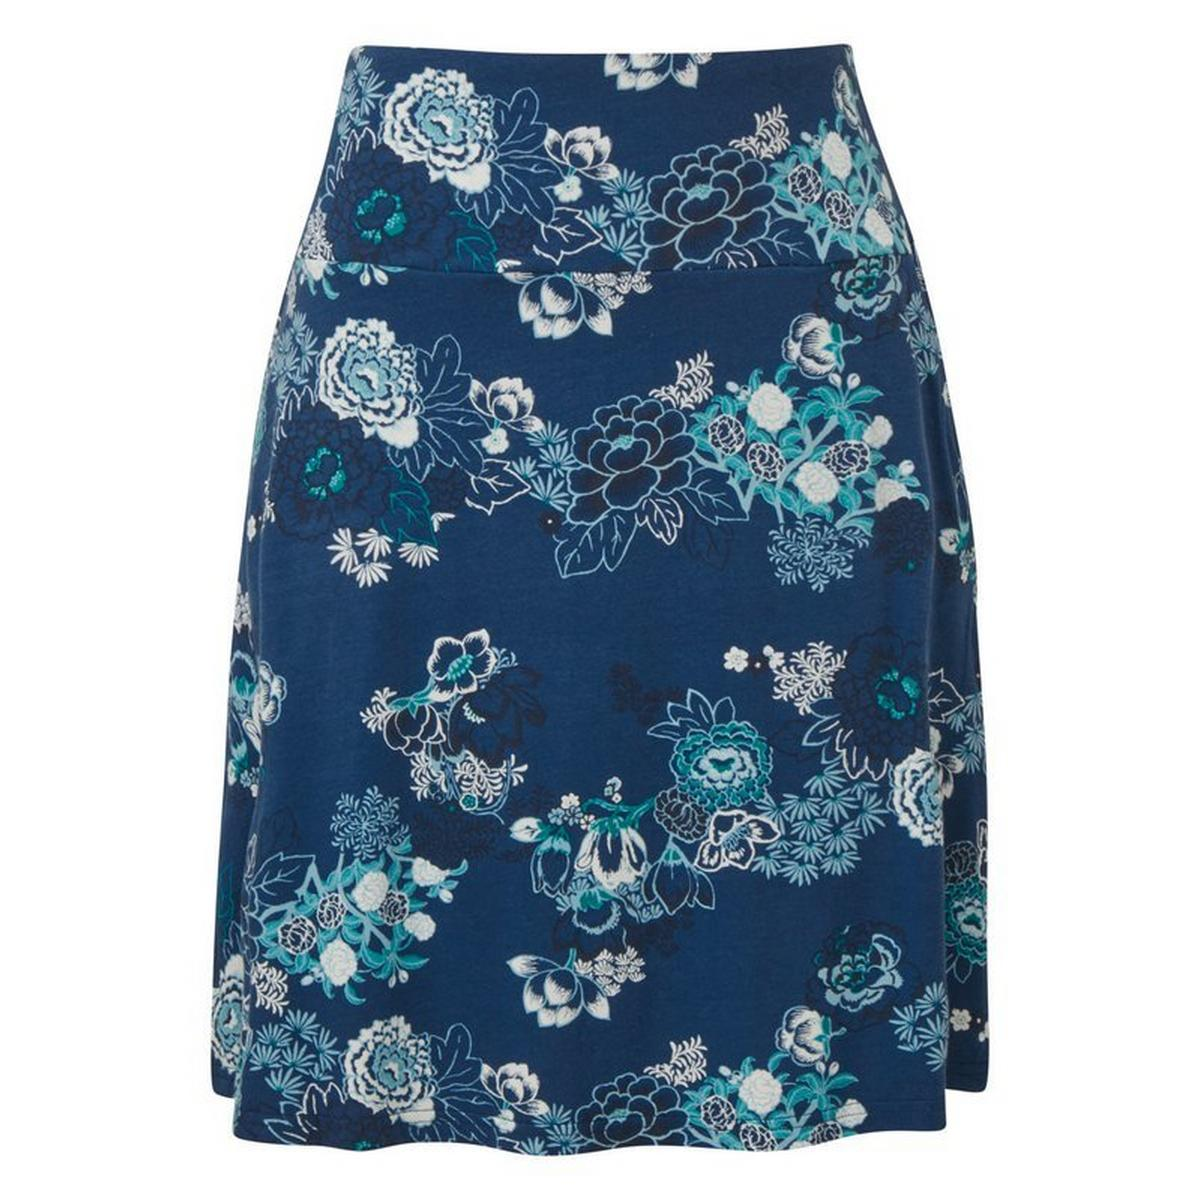 Sherpa Adventure Women's Padma Skirt - Blue